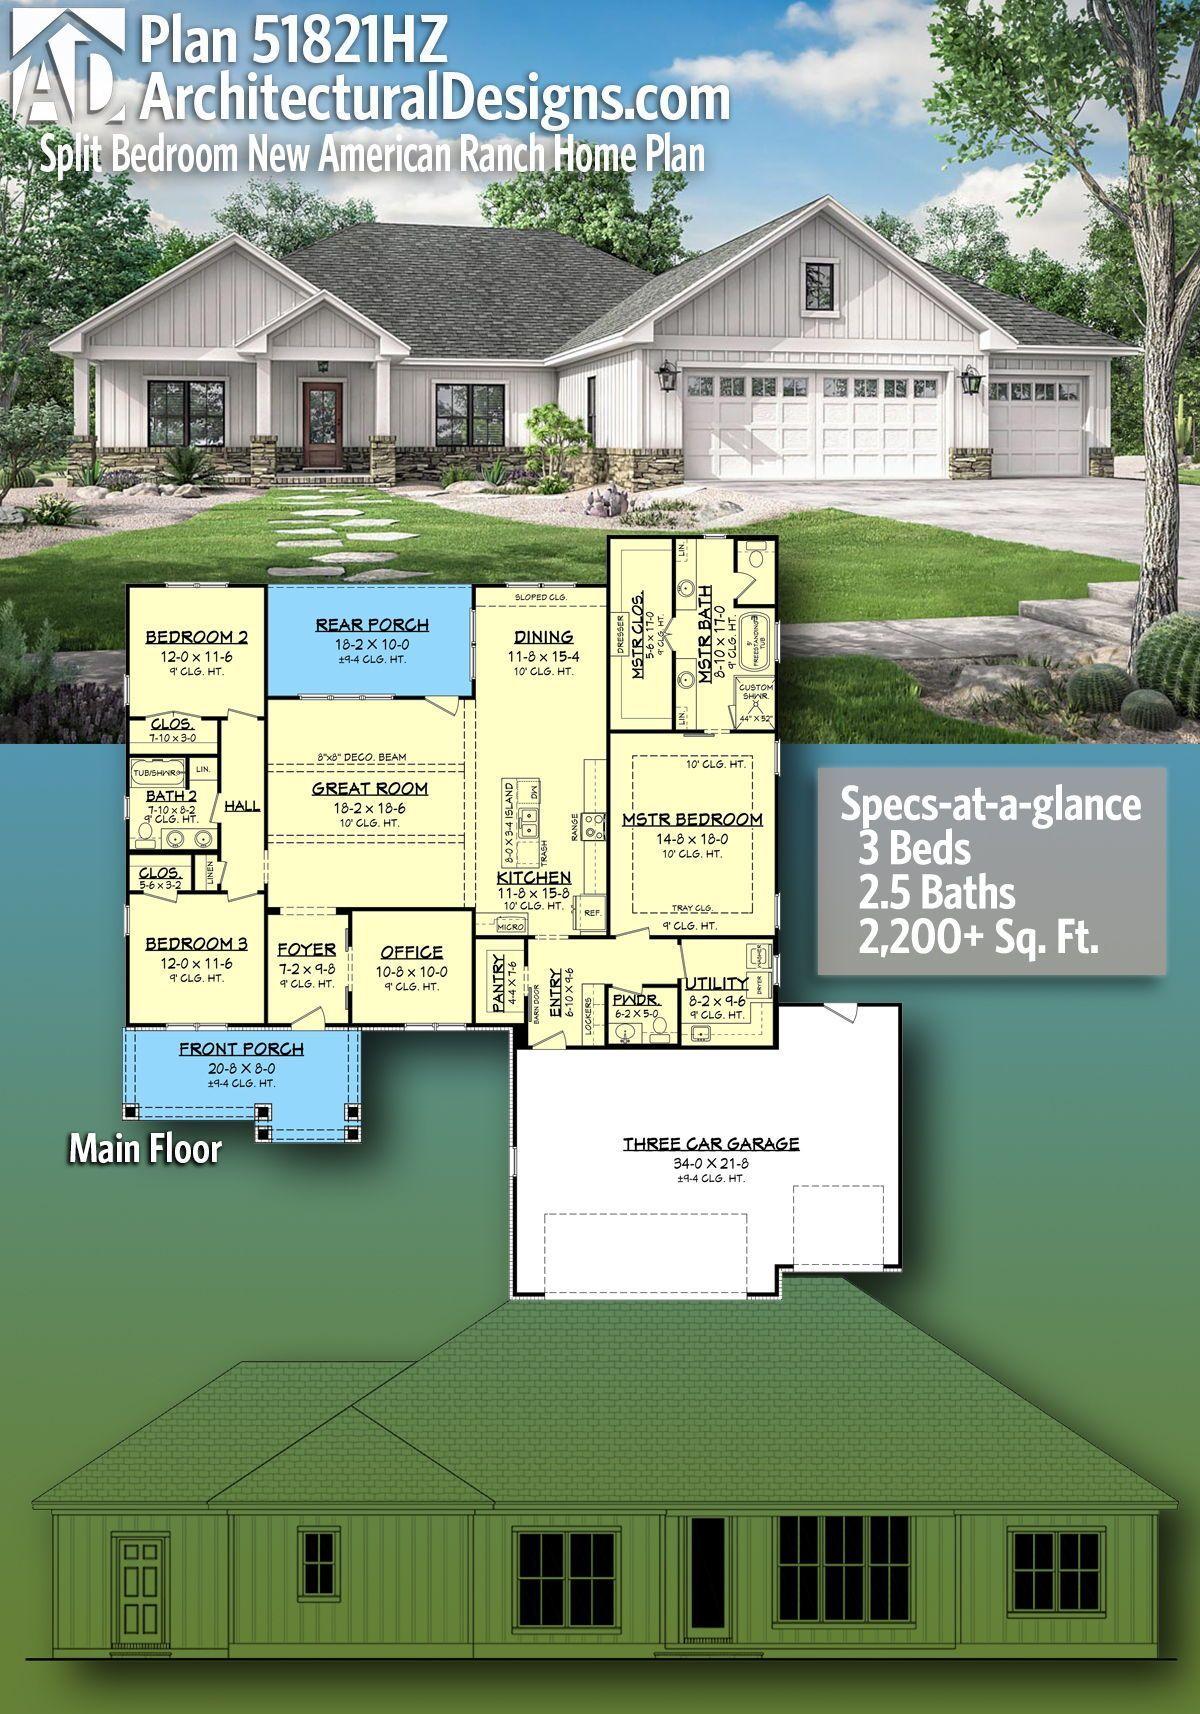 Plan 51821hz Split Bedroom New American Ranch Home Plan In 2020 Ranch House Plans New House Plans Craftsman House Plans